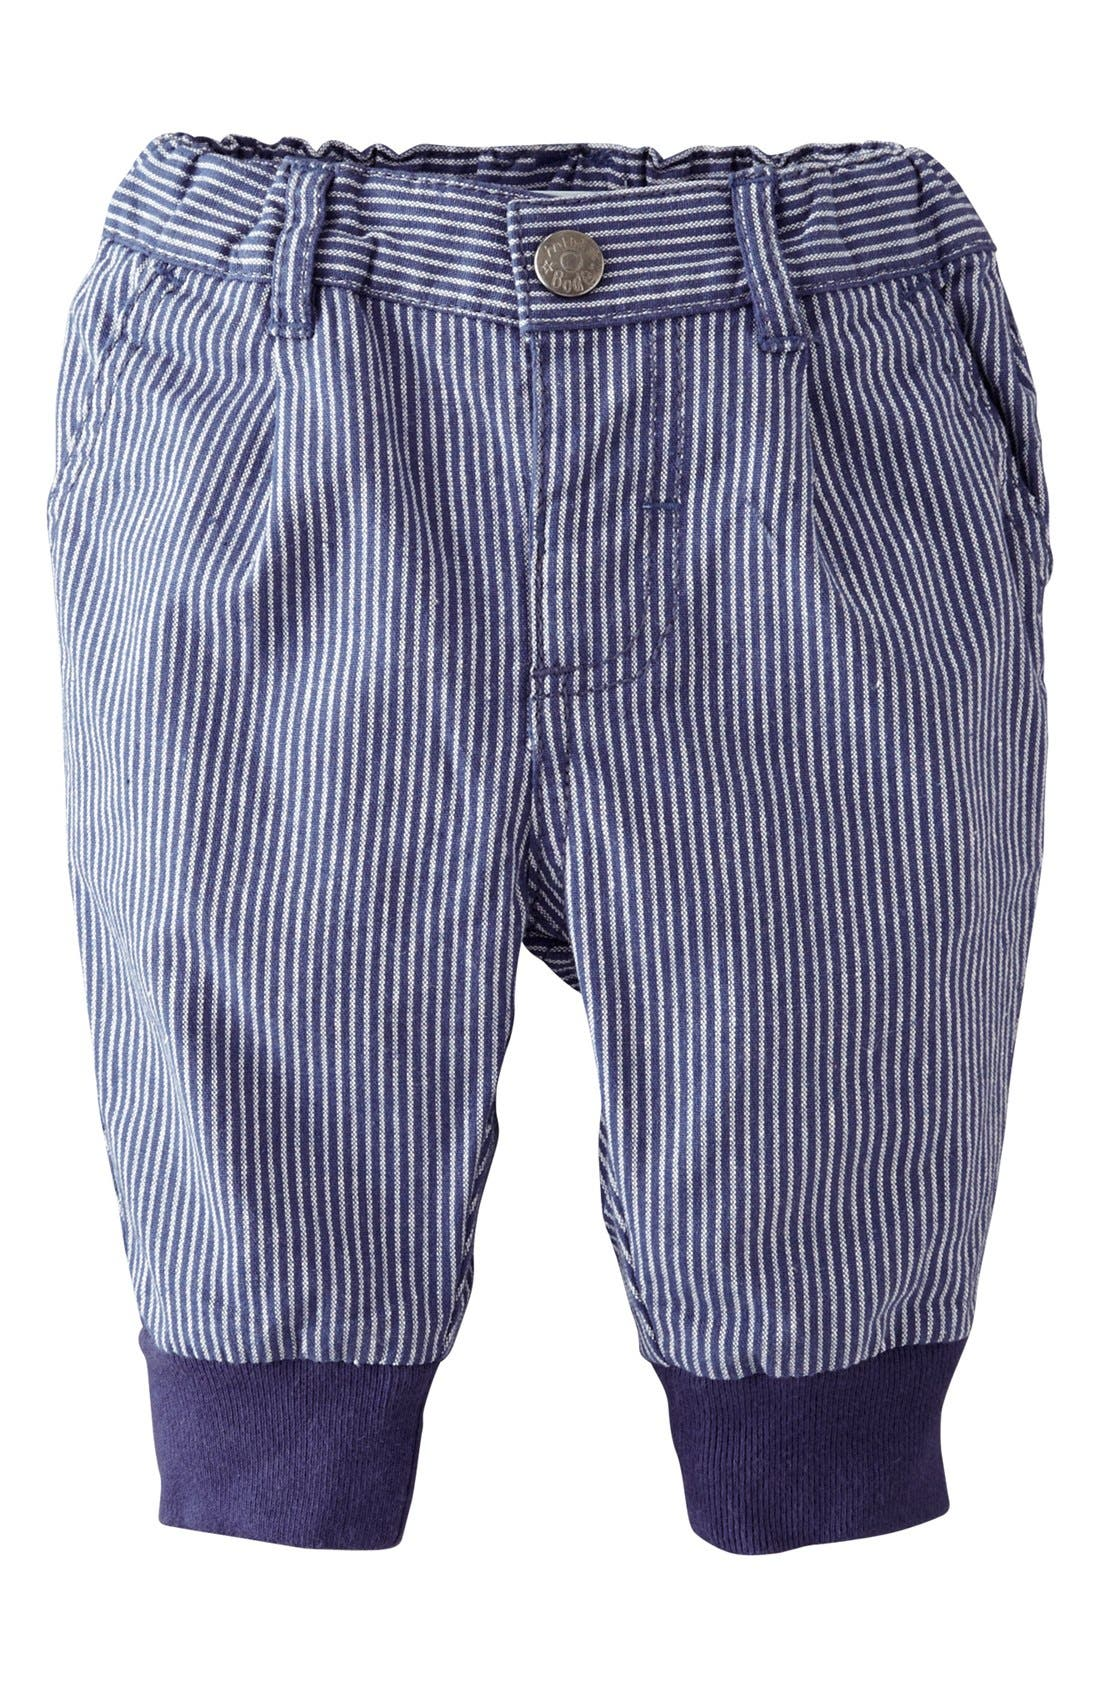 Main Image - Mini Boden Ribbed Cuff Pants (Baby Boys)